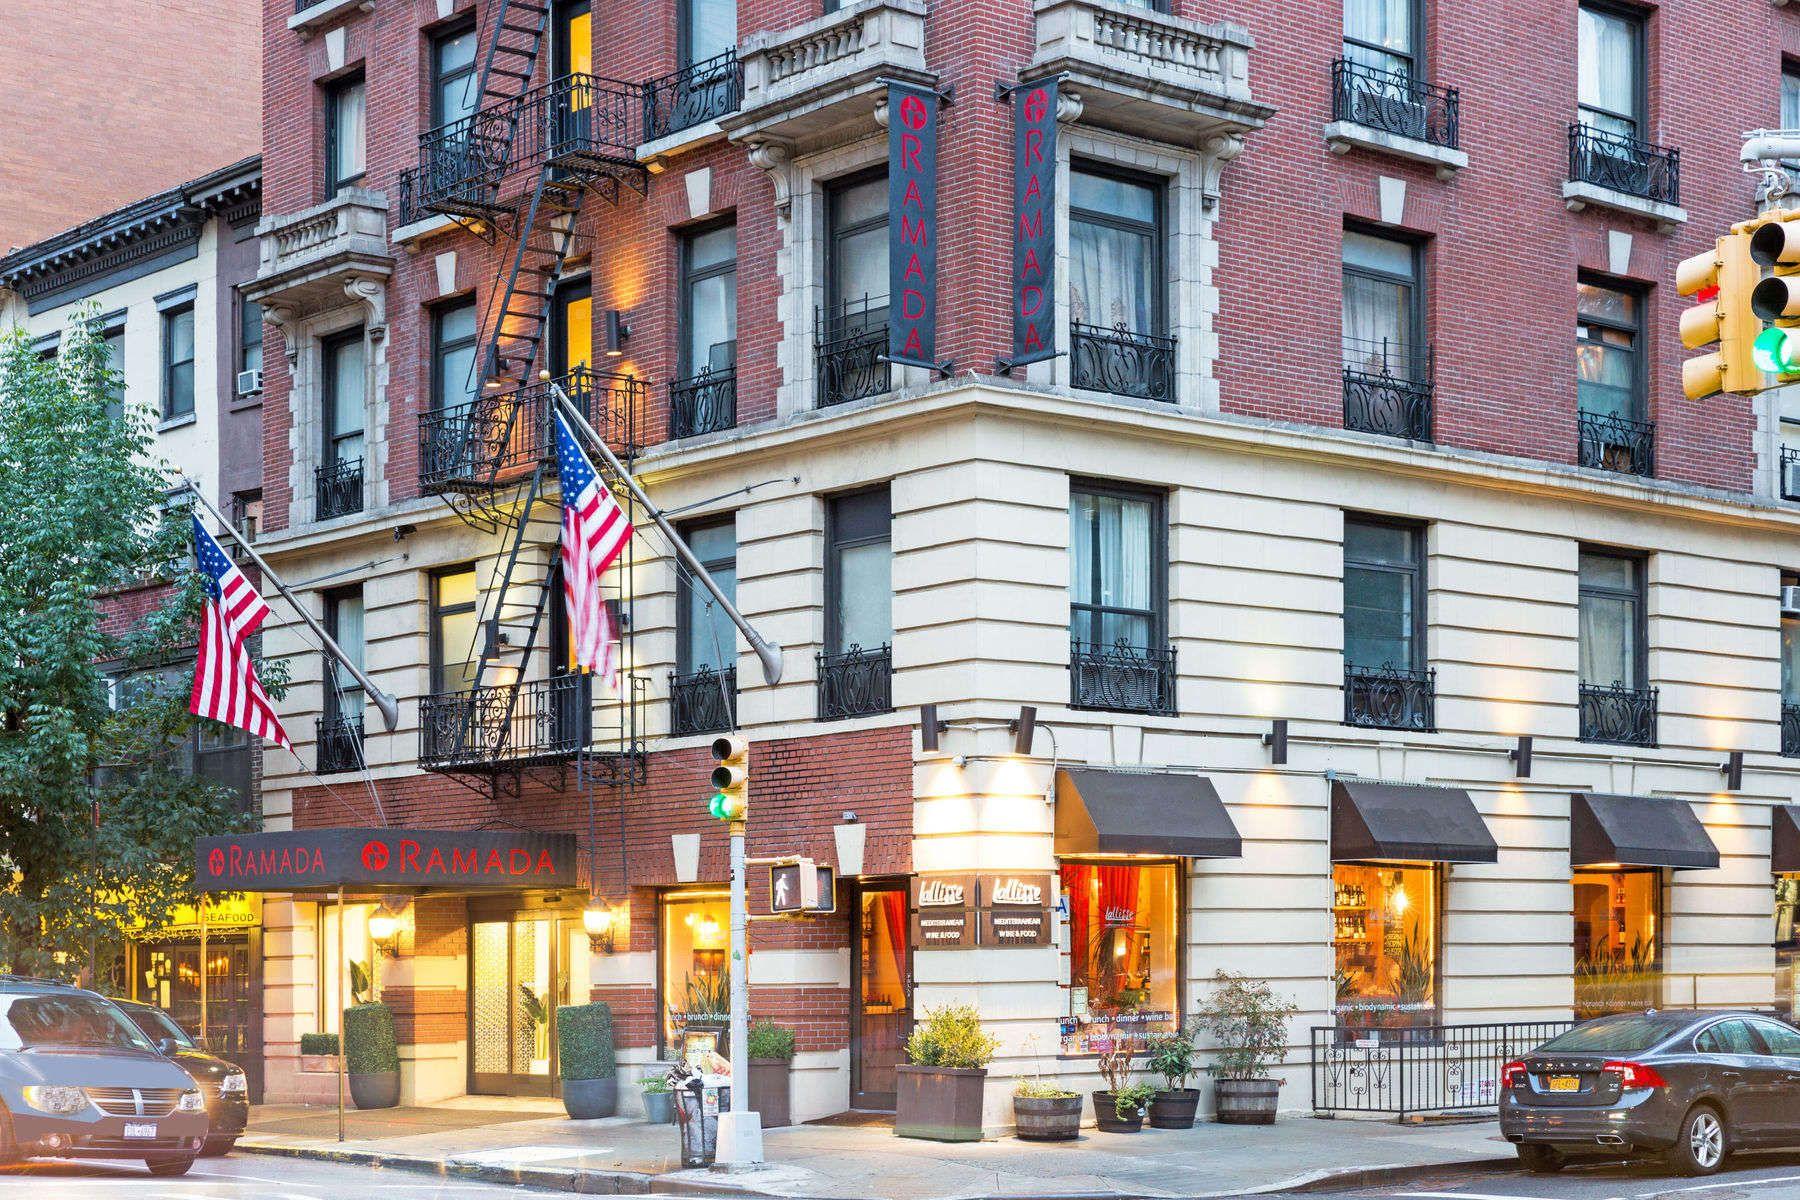 Manhattan hotel within walking distance of Empire State